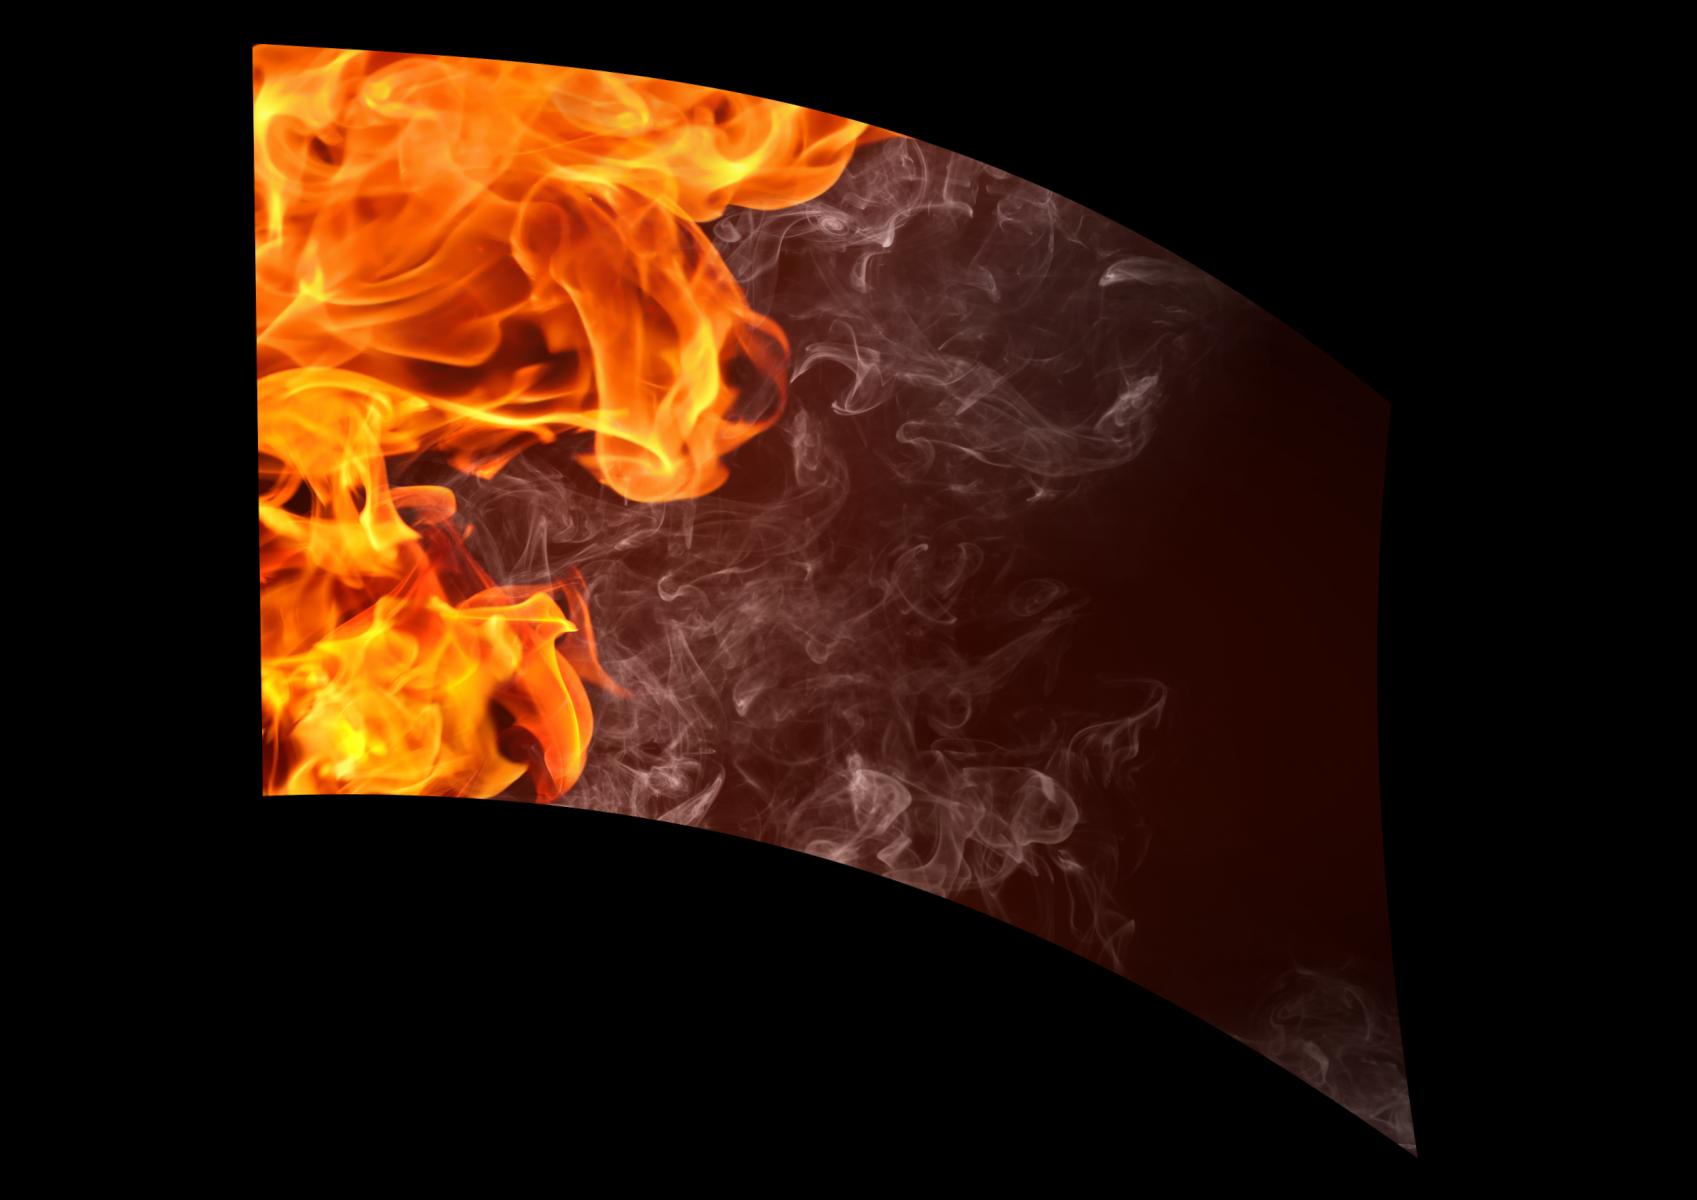 040111s - 36x54 Standard Fire and Smoke